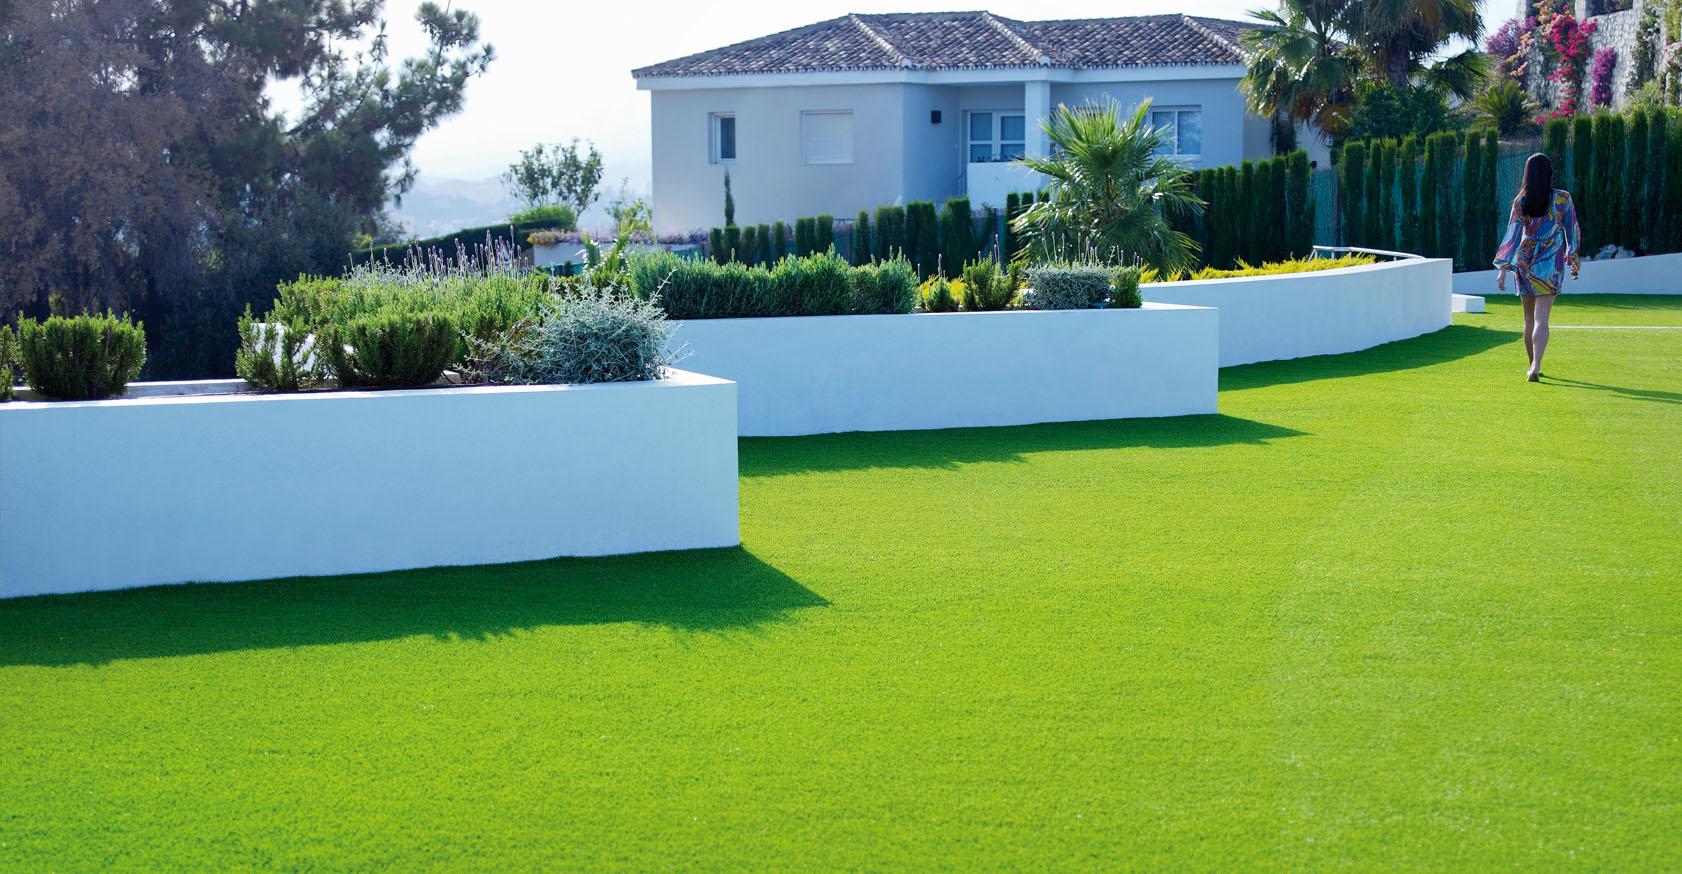 grama sintetica para jardim florianopolis : grama sintetica para jardim florianopolis:Artificial Grass Installer